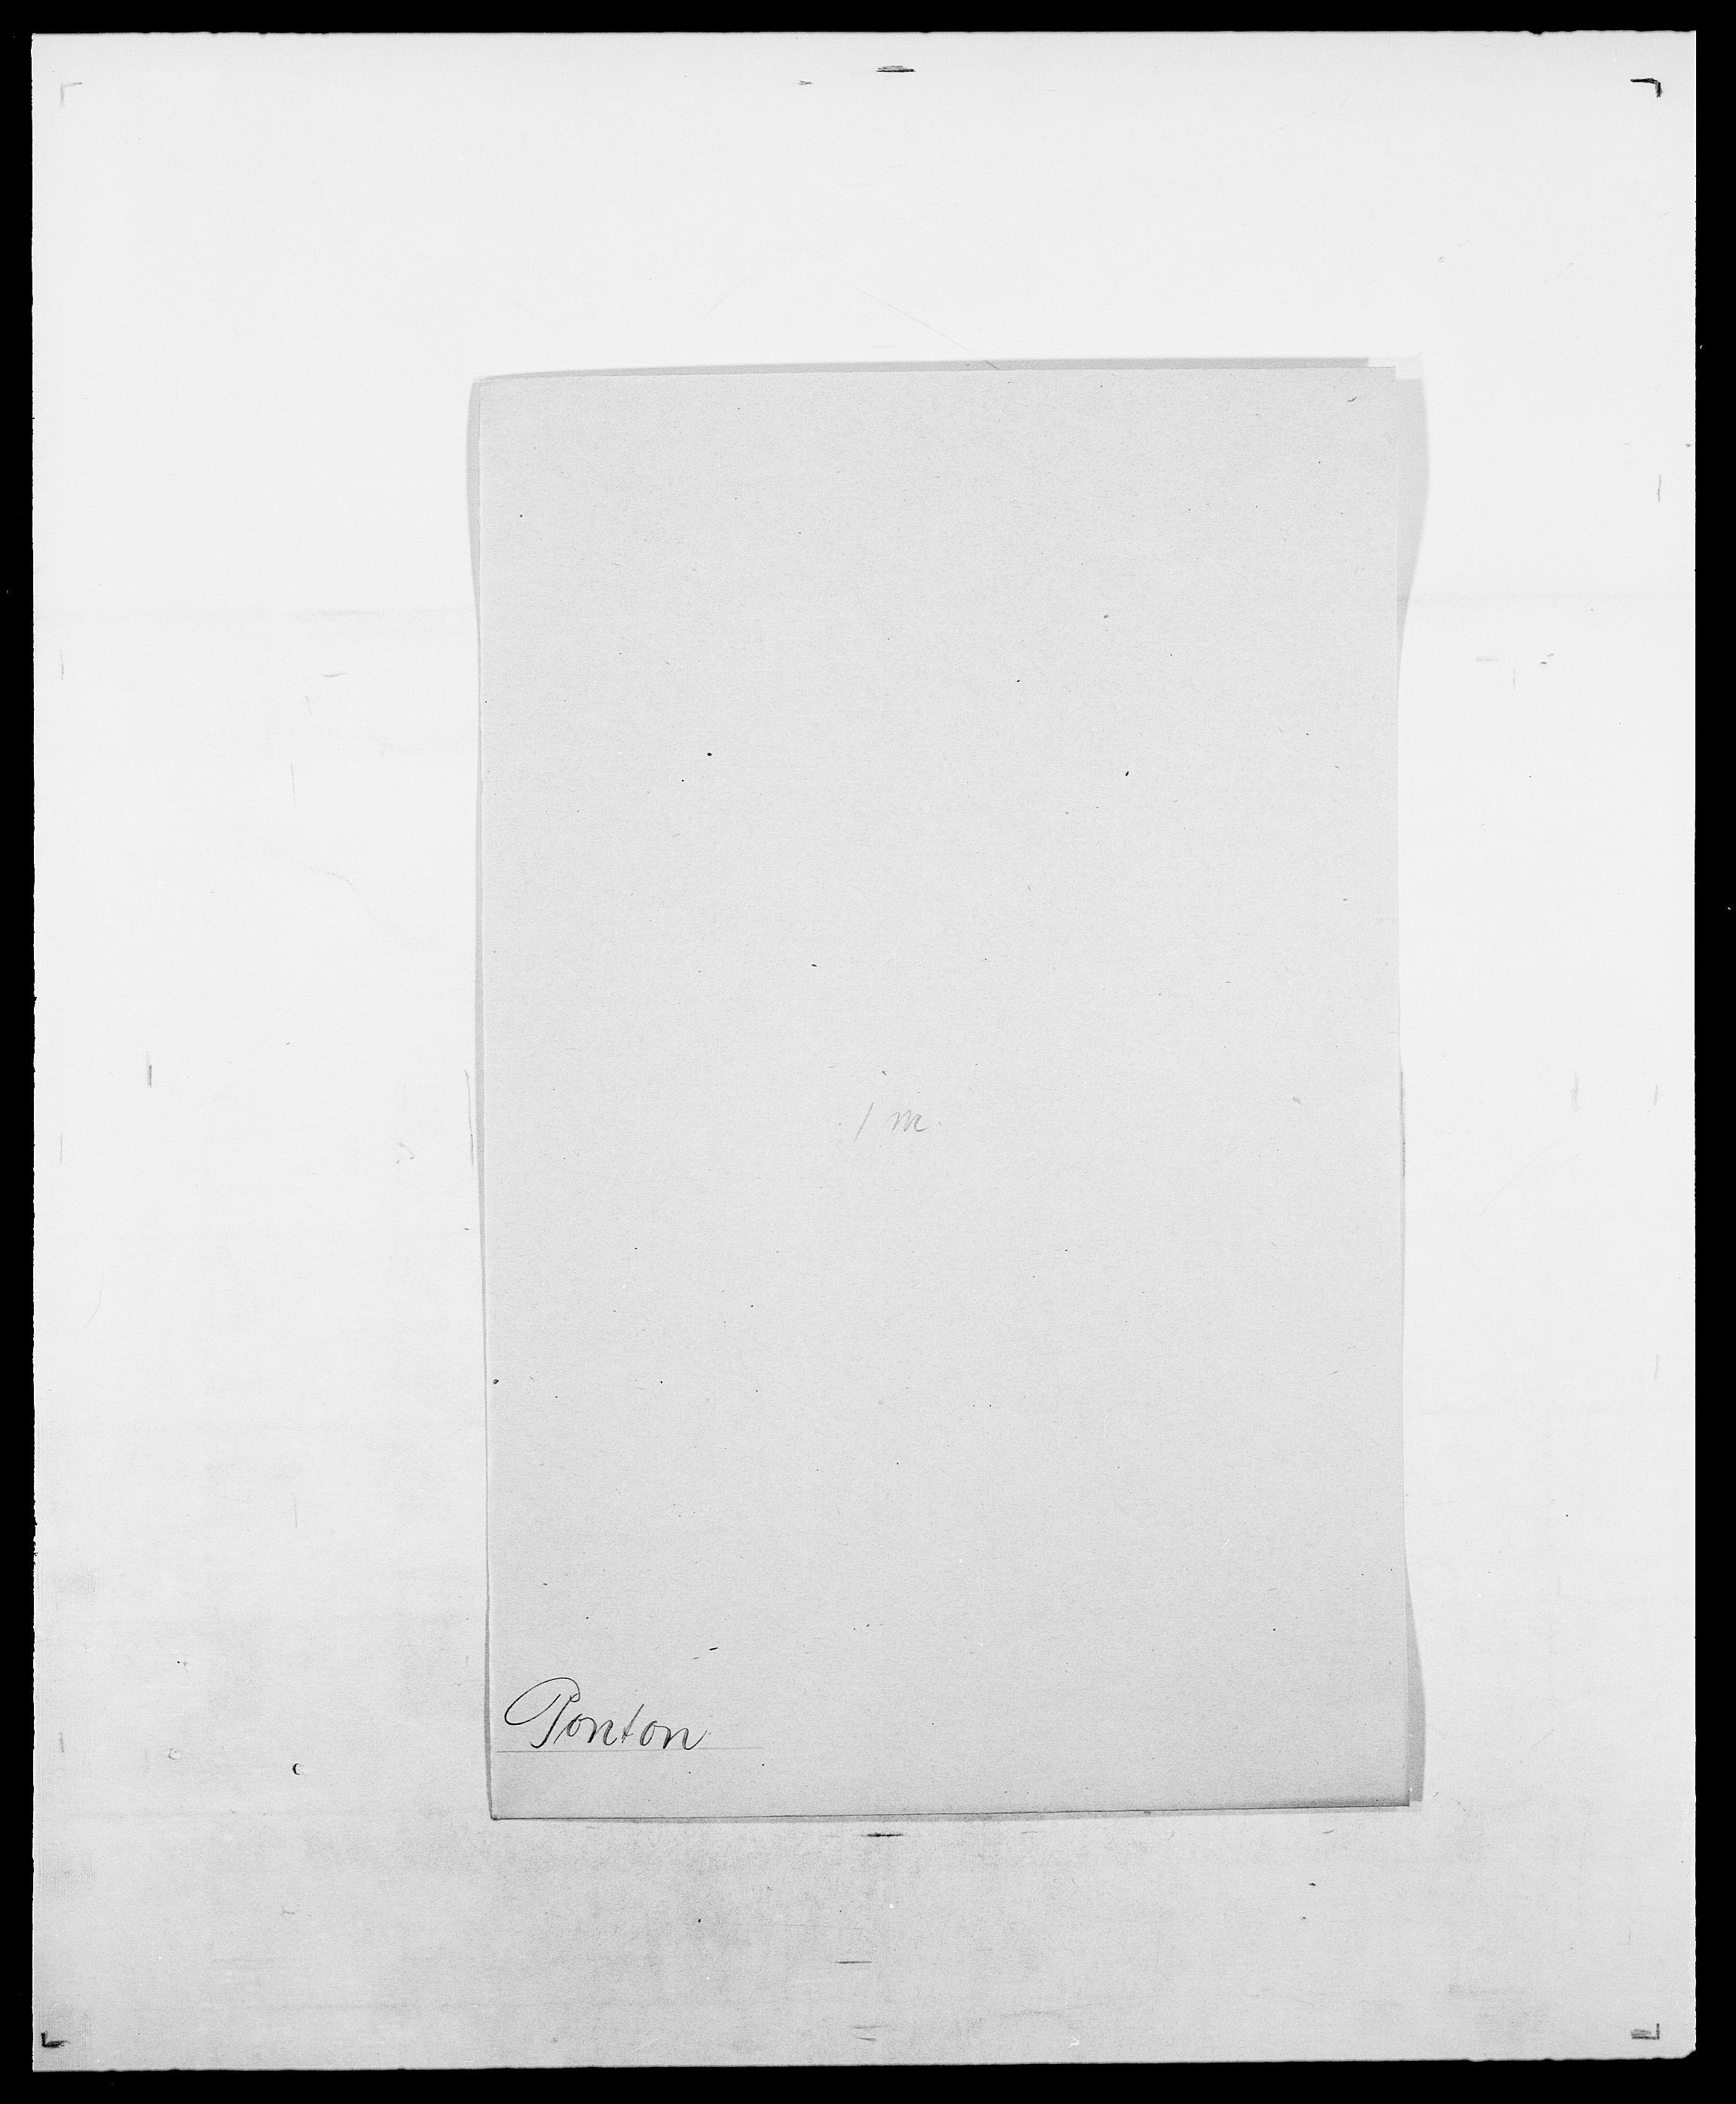 SAO, Delgobe, Charles Antoine - samling, D/Da/L0031: de Place - Raaum, s. 206